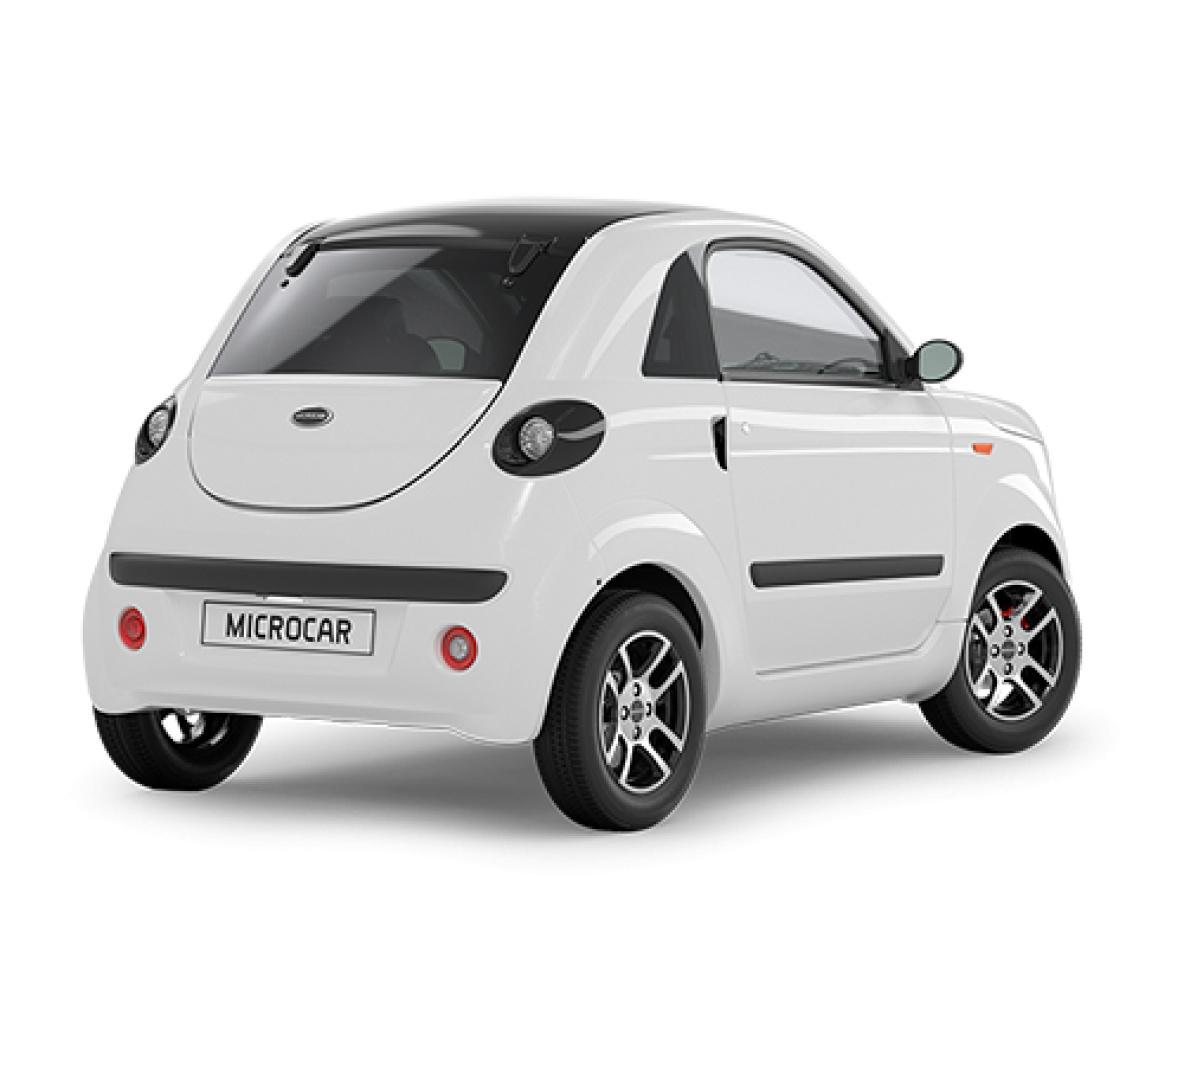 Microcar-Microcar Dué Plus Progress-1